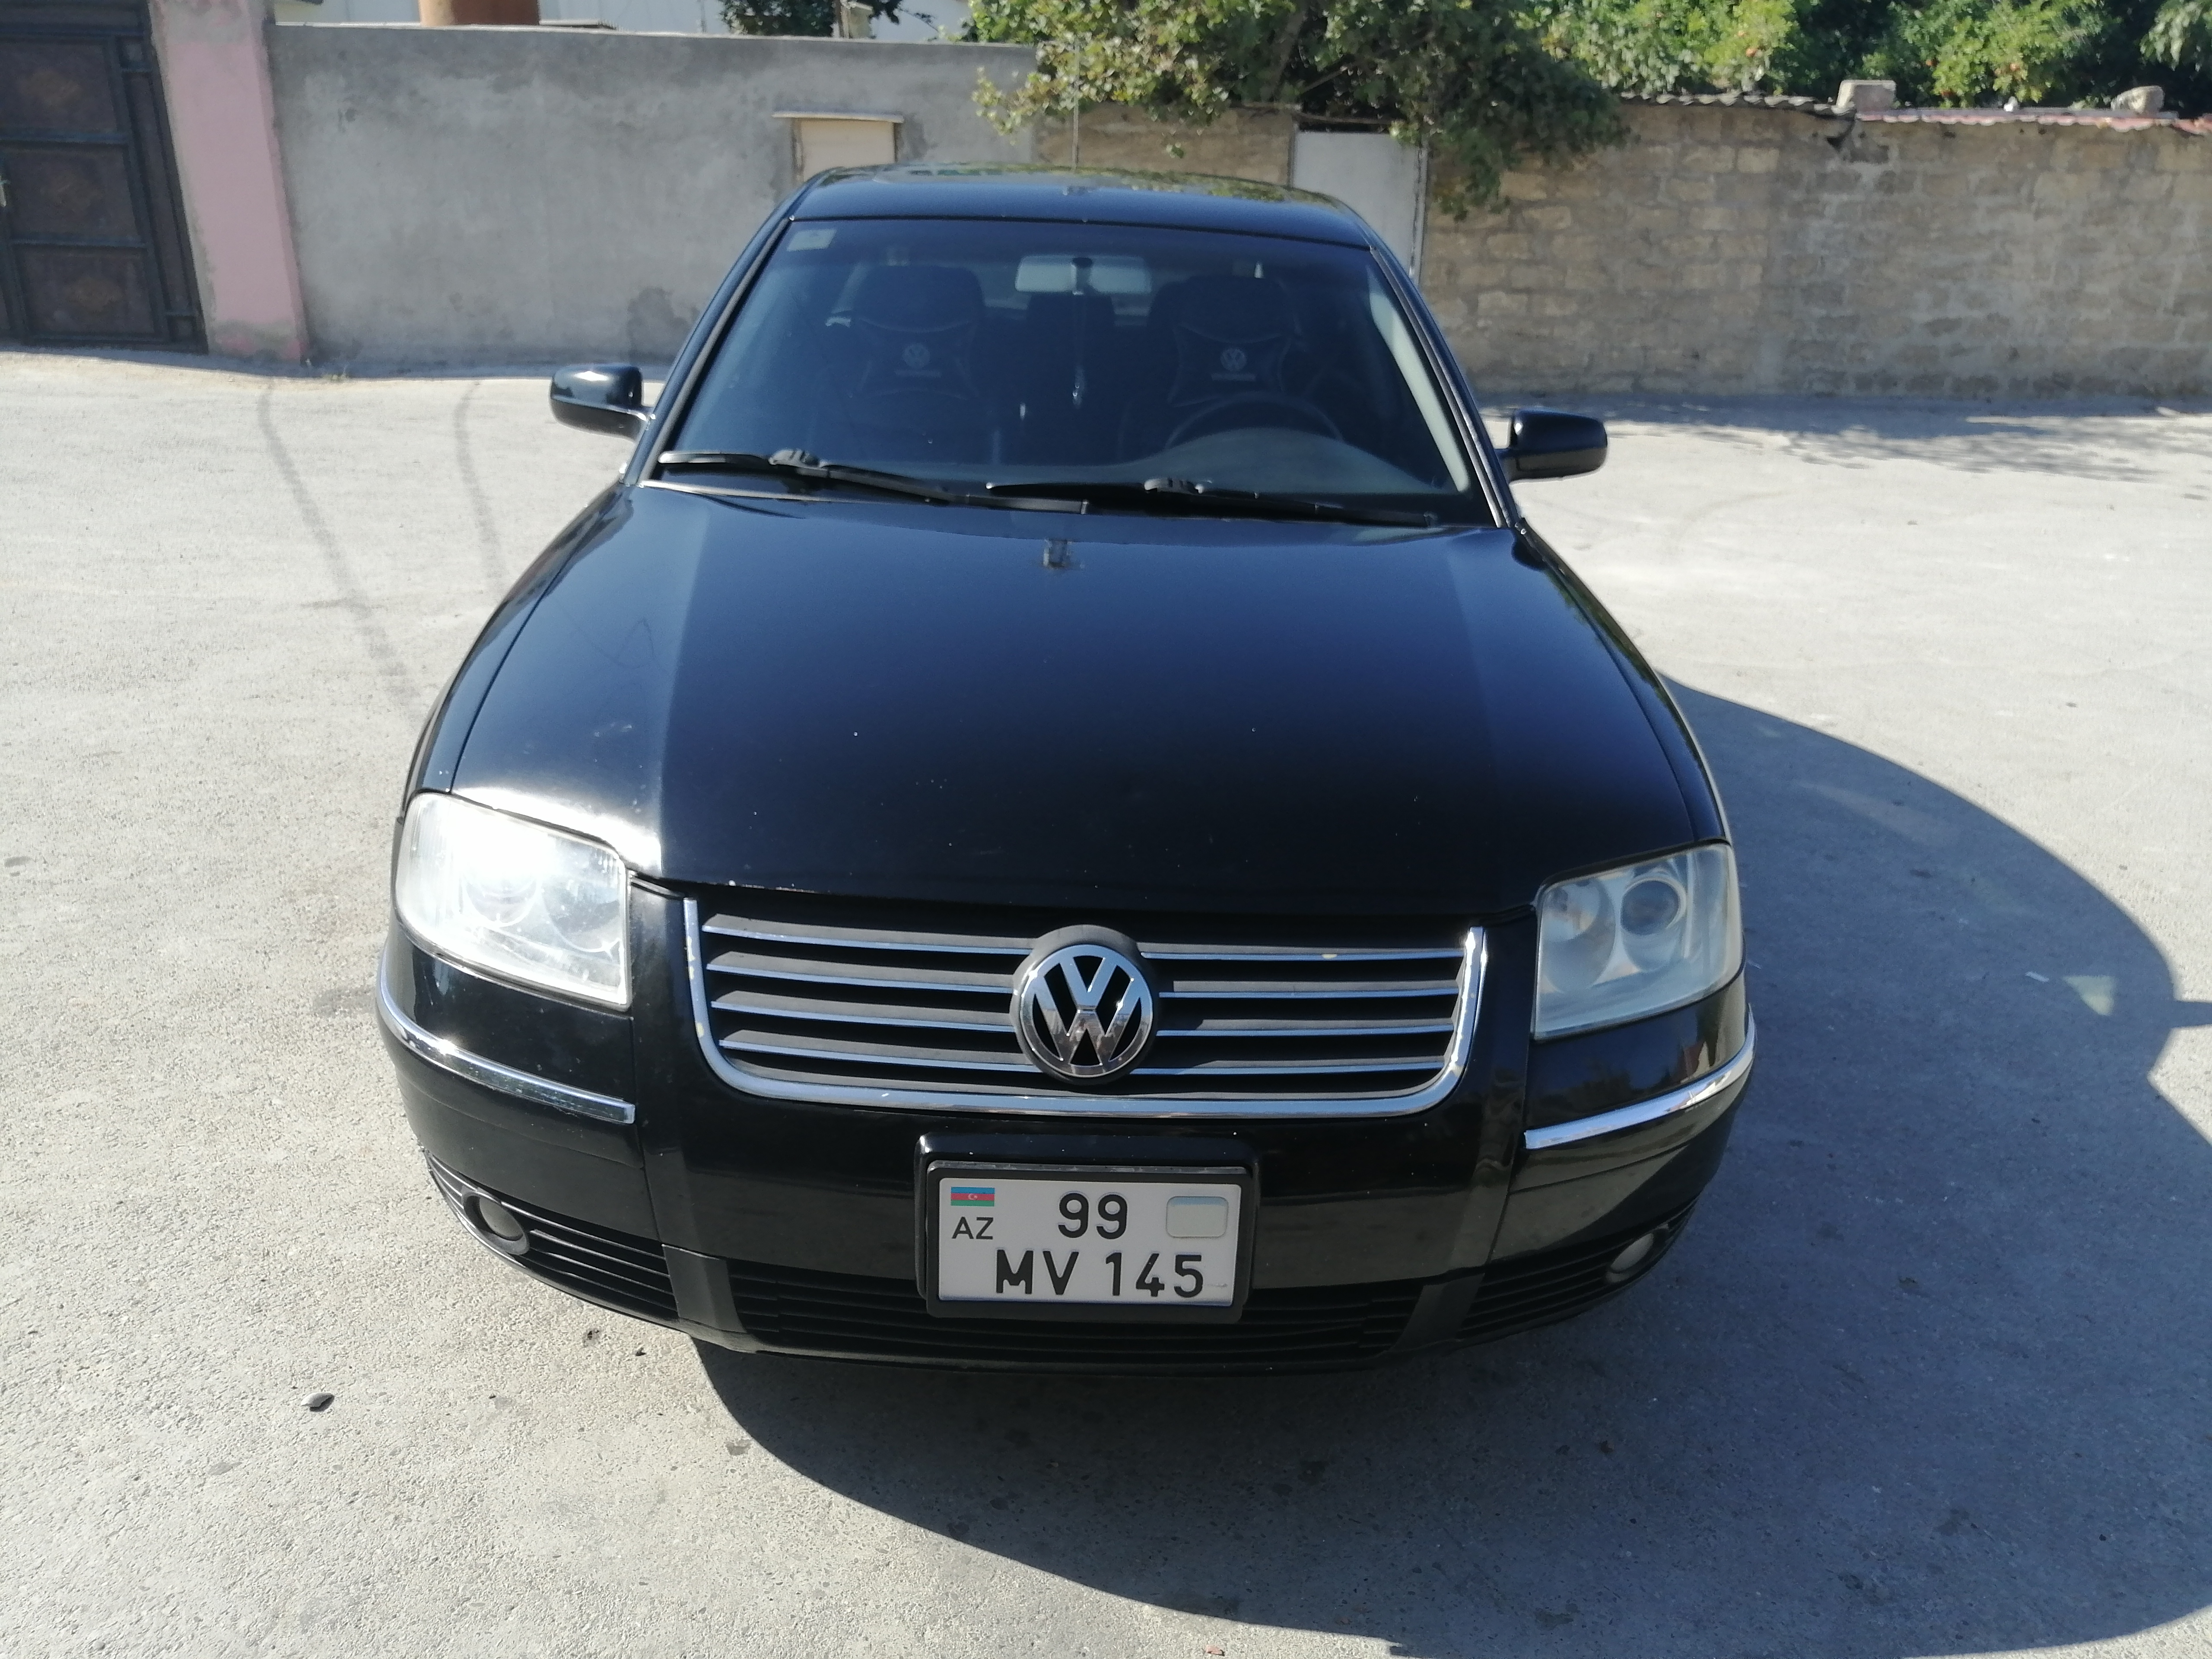 Volkswagen Passat 1.8(lt) 2002 İkinci əl  $7700